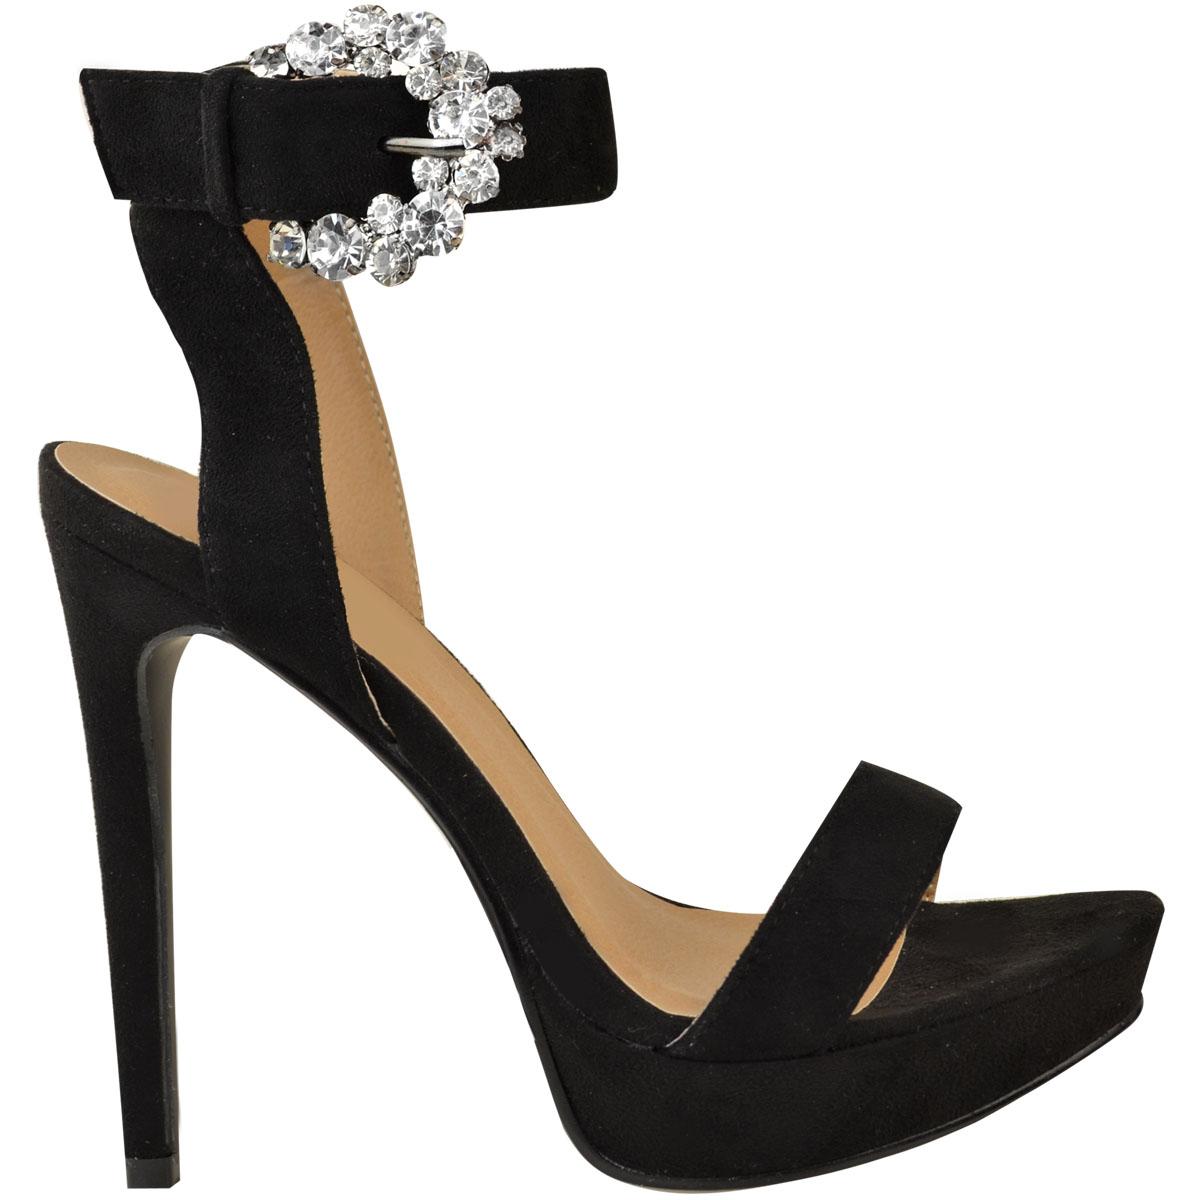 Womens-Ladies-Stilettos-High-Heels-Strappy-Platforms-Sandals-Diamante-Shoes-Size thumbnail 31